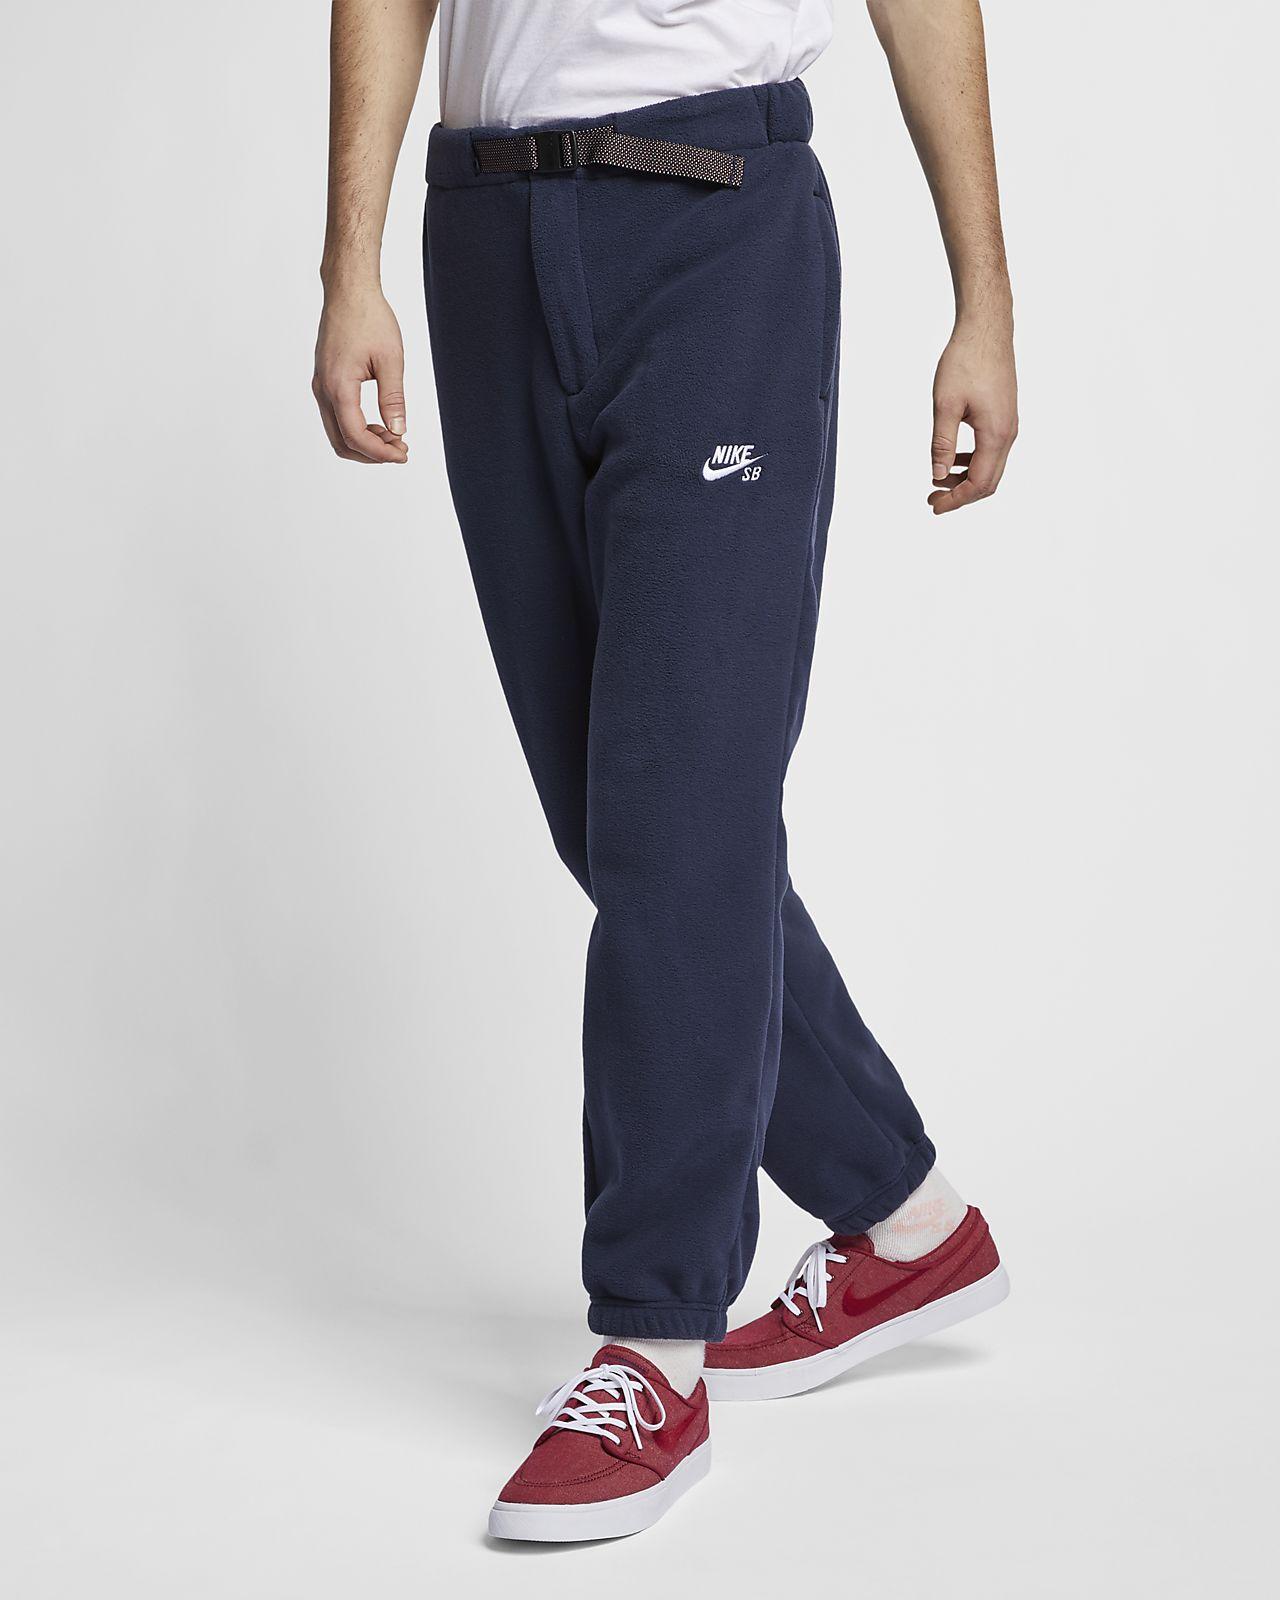 Nike SB Skateboard-Hose für Herren